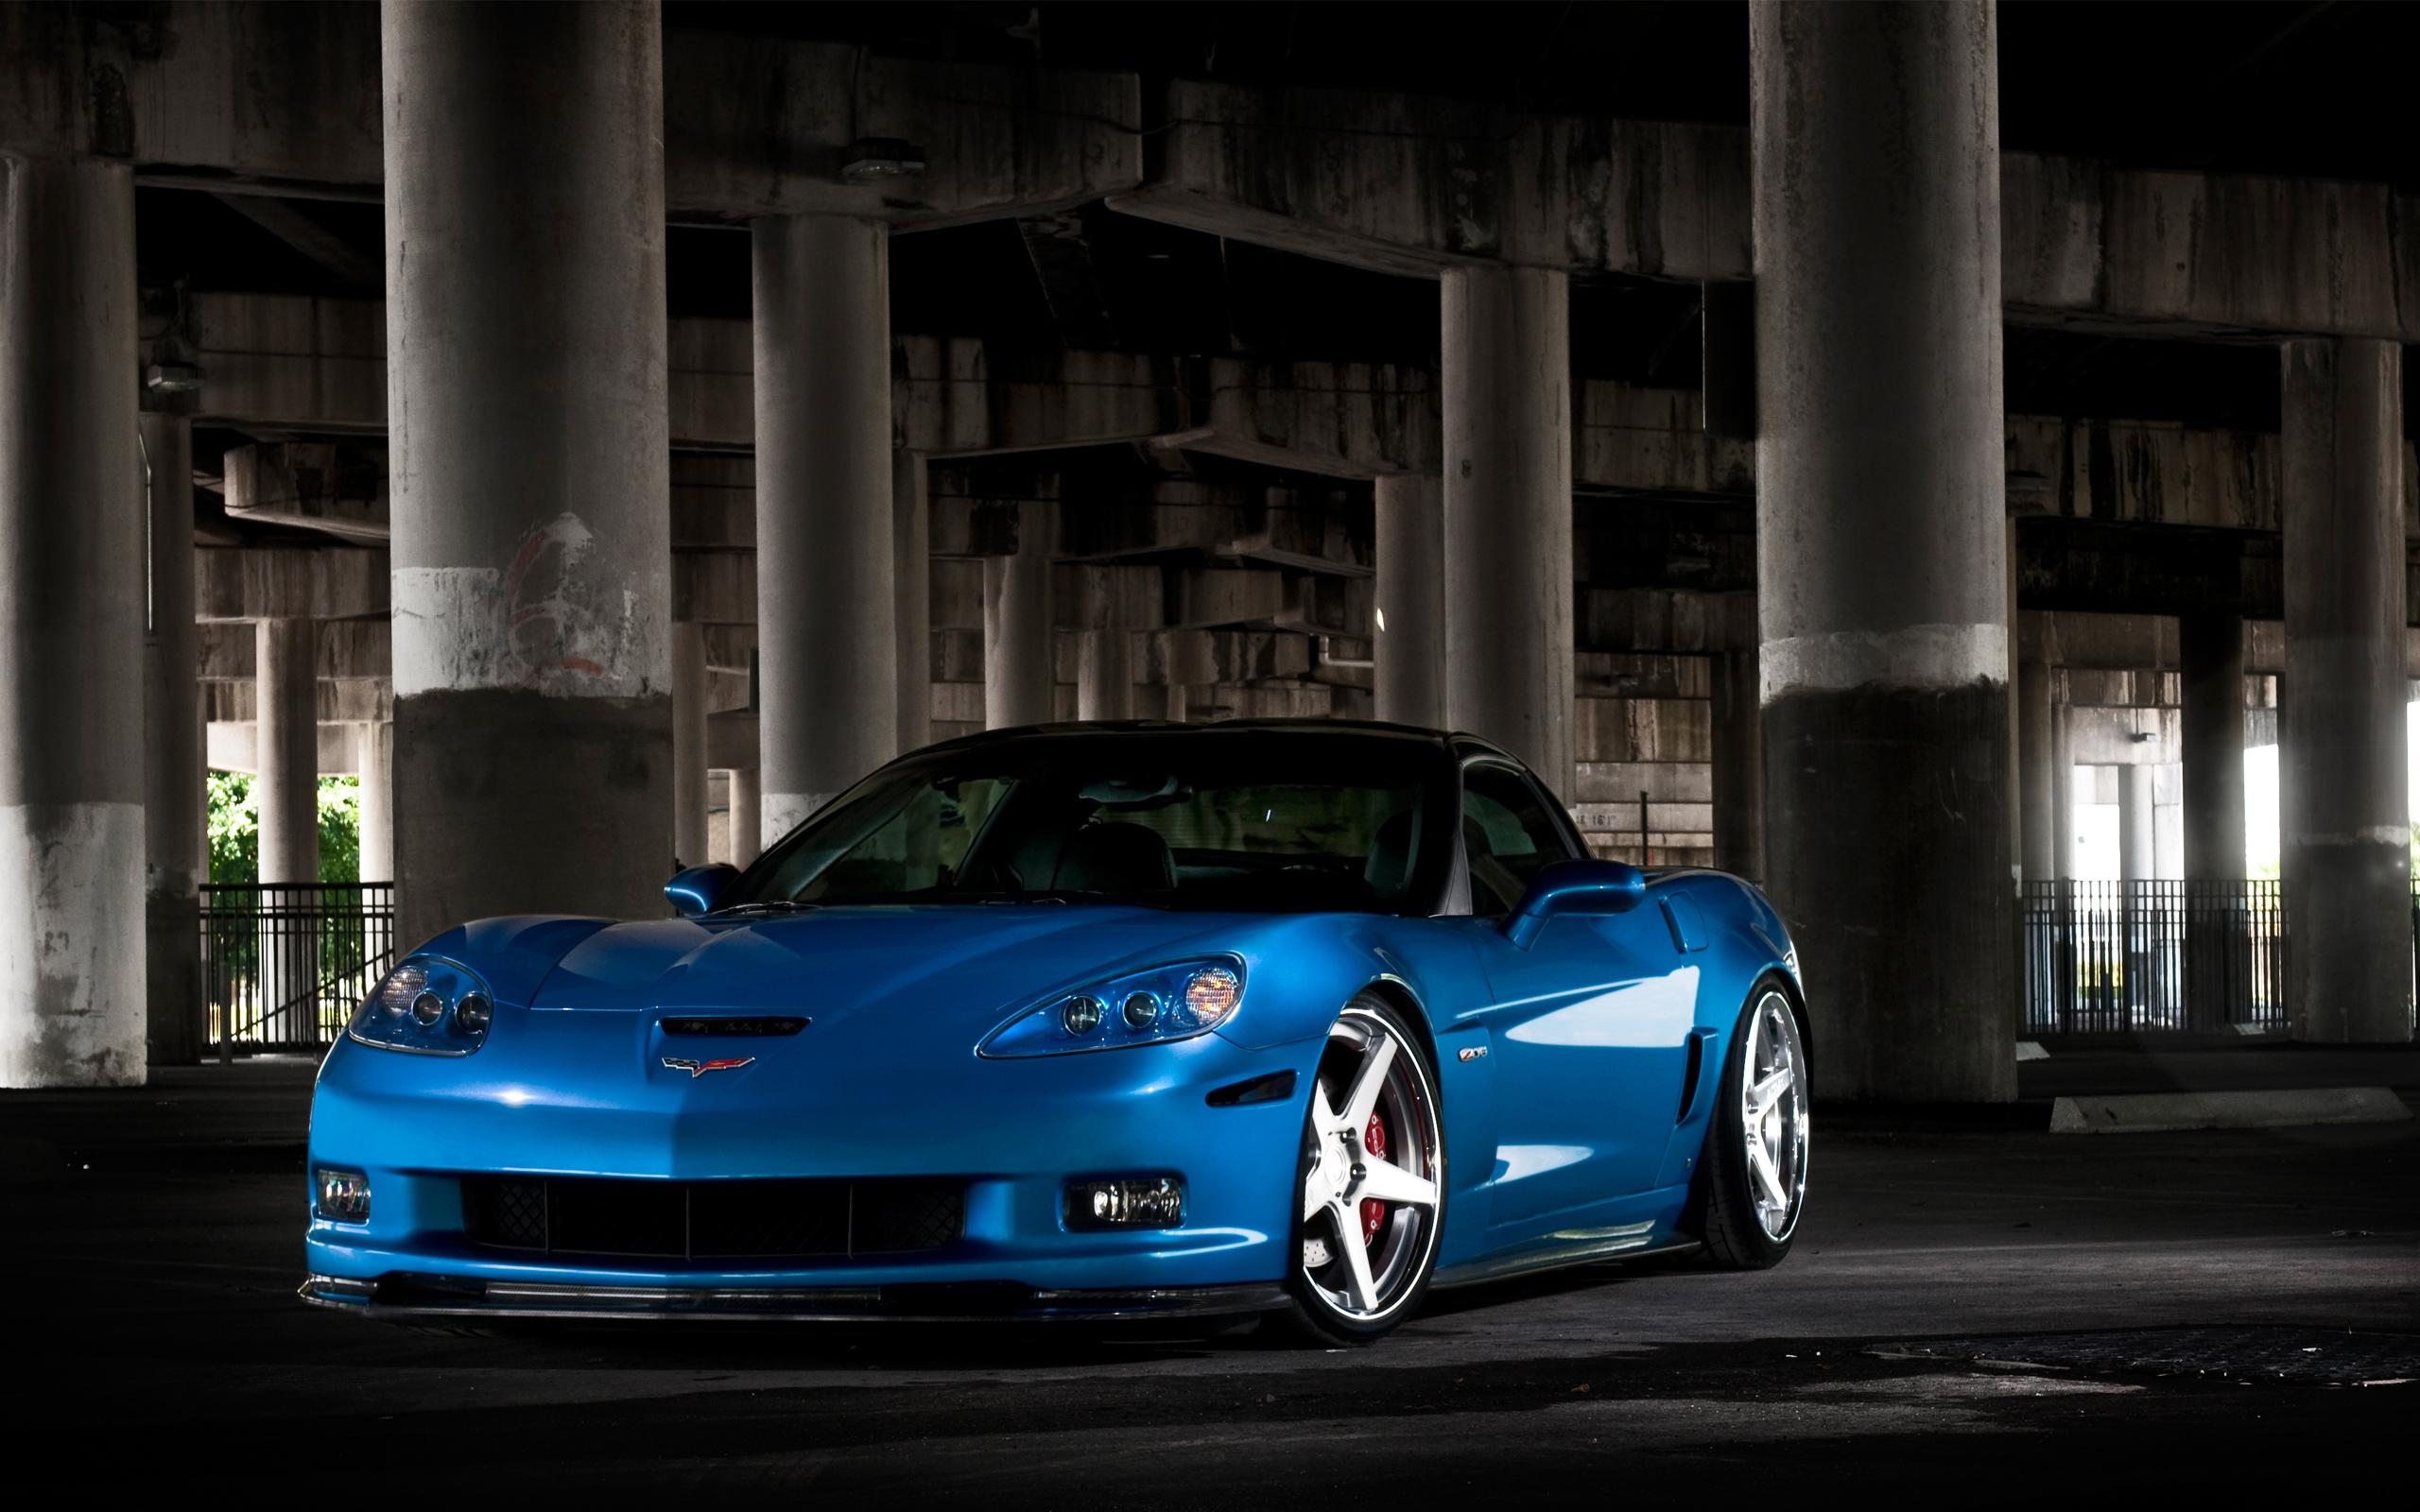 Chevrolet Corvette C6 ZR1 Car Wallpapers HD Wallpapers 2560x1600